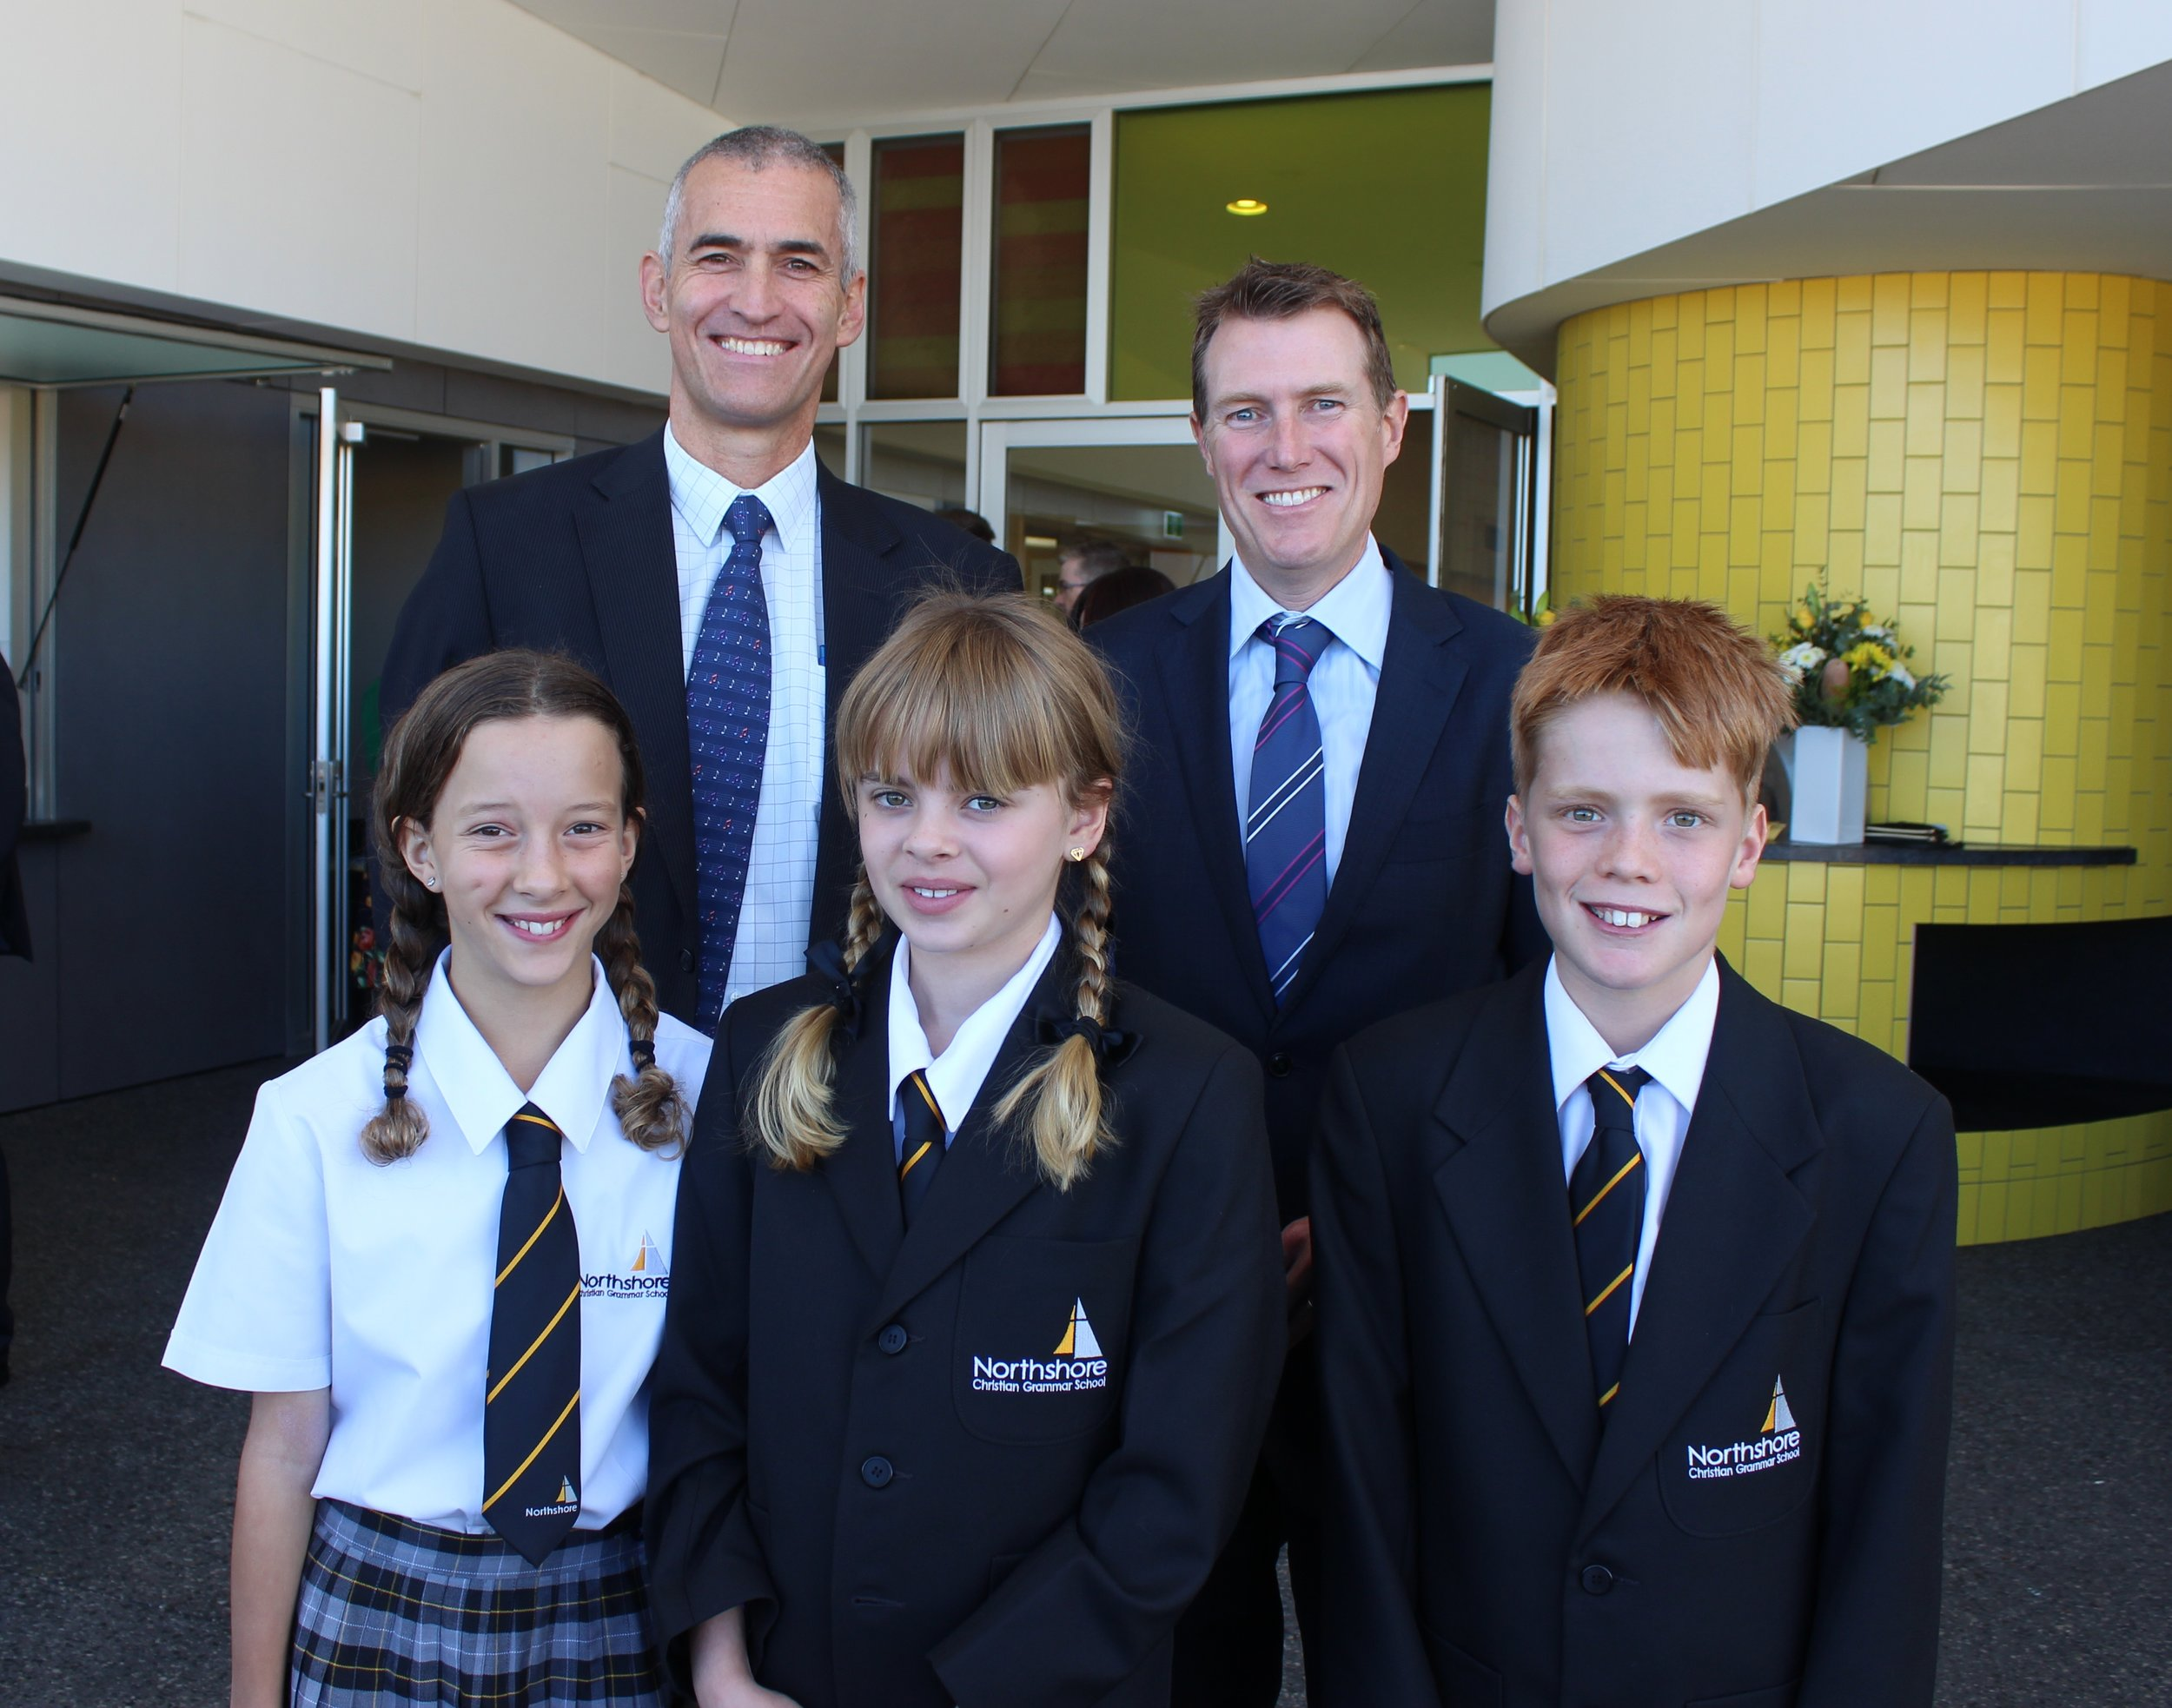 CEO Swan Christian Education Associate: Mr Neil David, MHR Christian Porter, MC Year 6 student: Dakota Pearce, Head Girl: Jessica Whitear, Head Boy: Kade Harvey